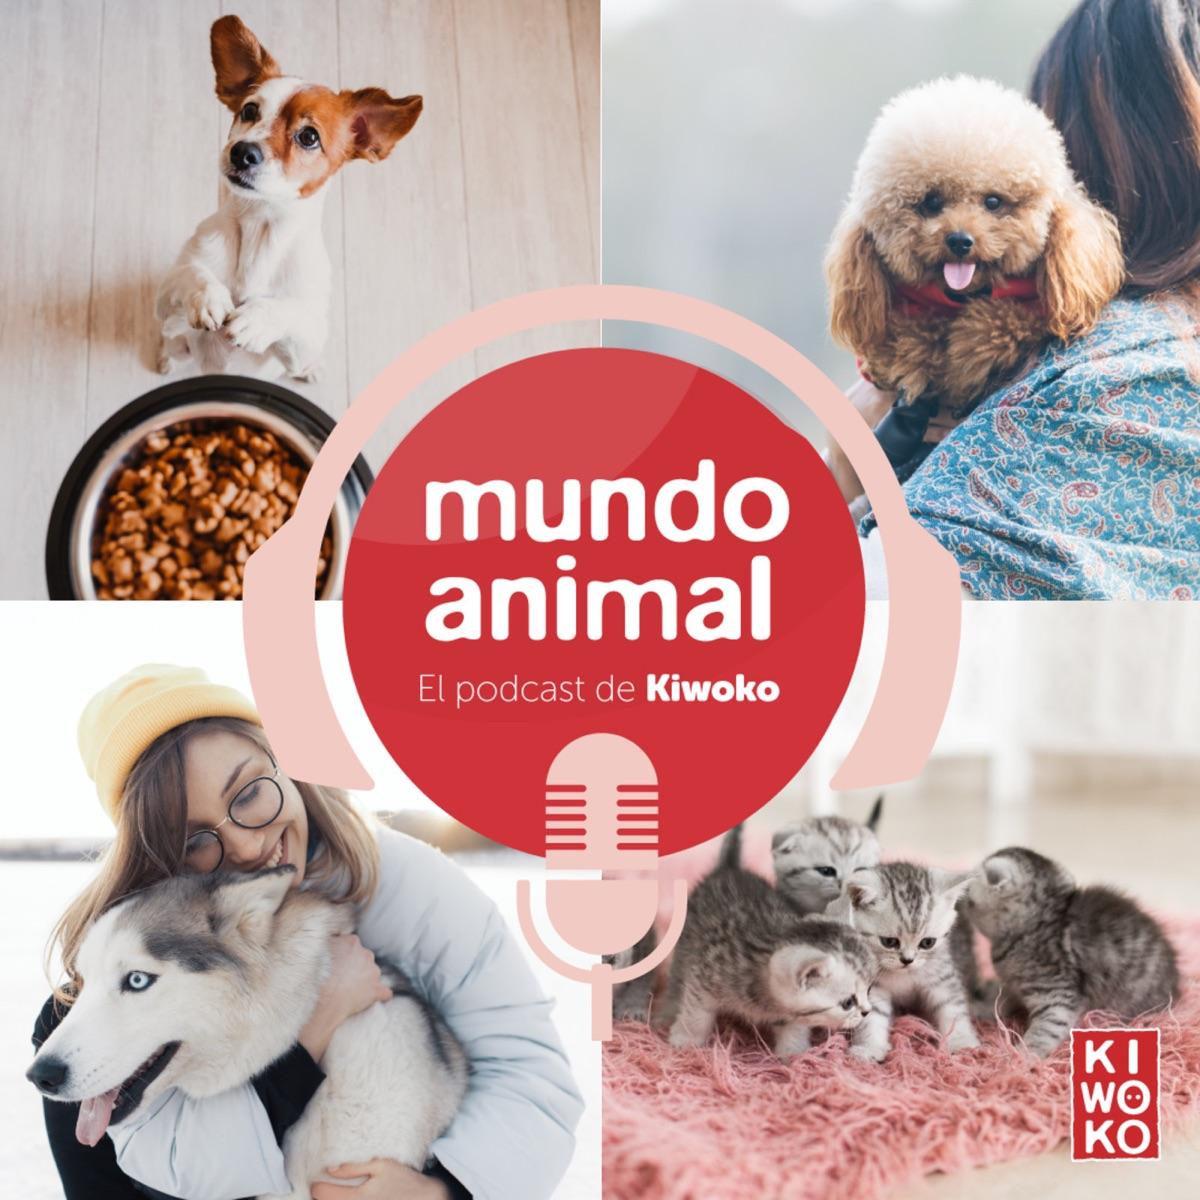 Mundo Animal - El podcast de Kiwoko